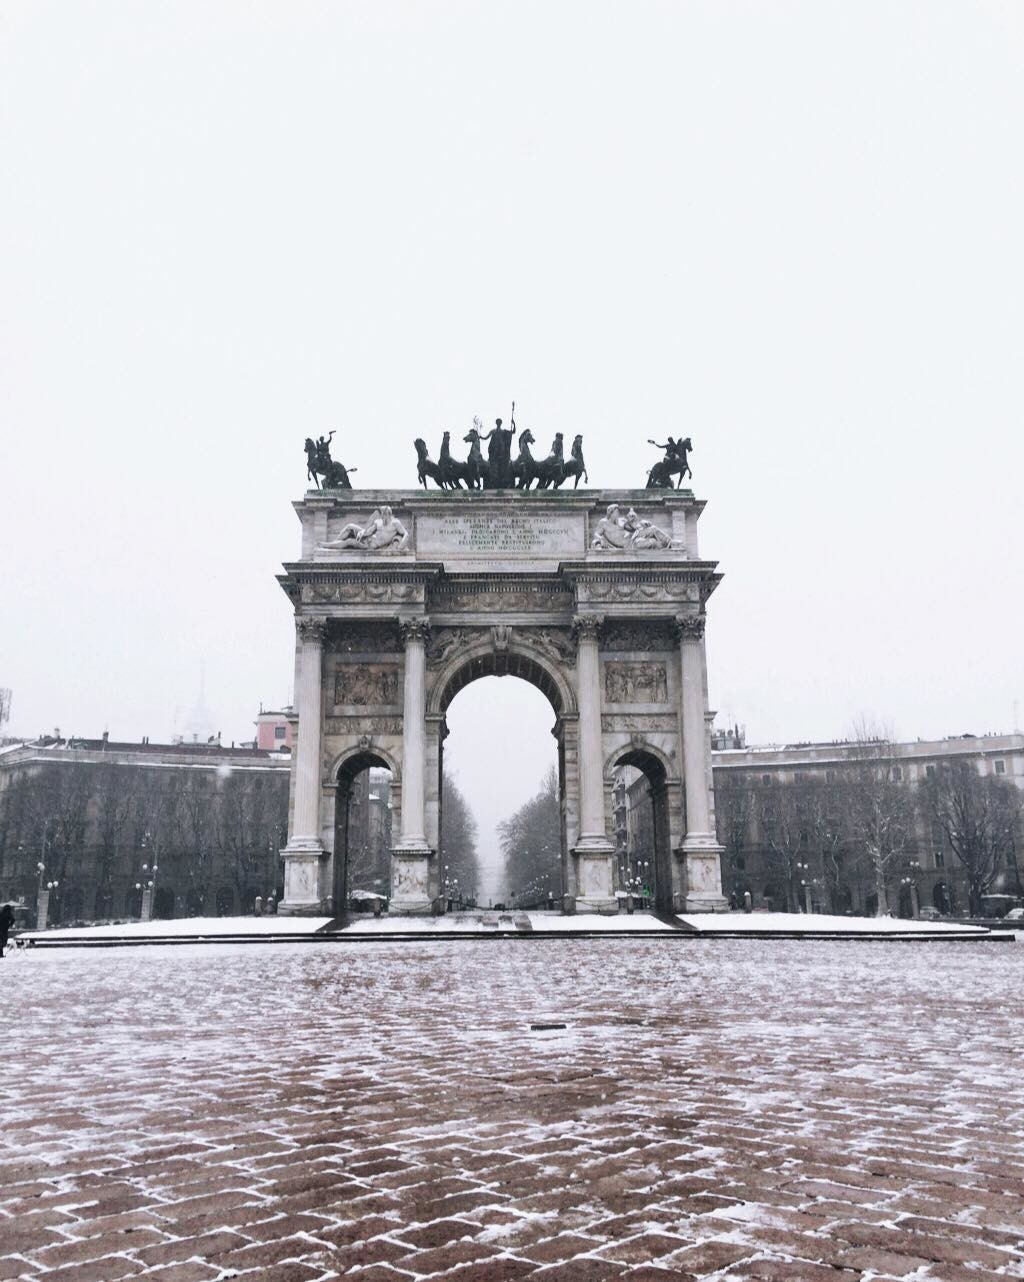 milan-snow-47d2bda11cfafc228b43a365537ac